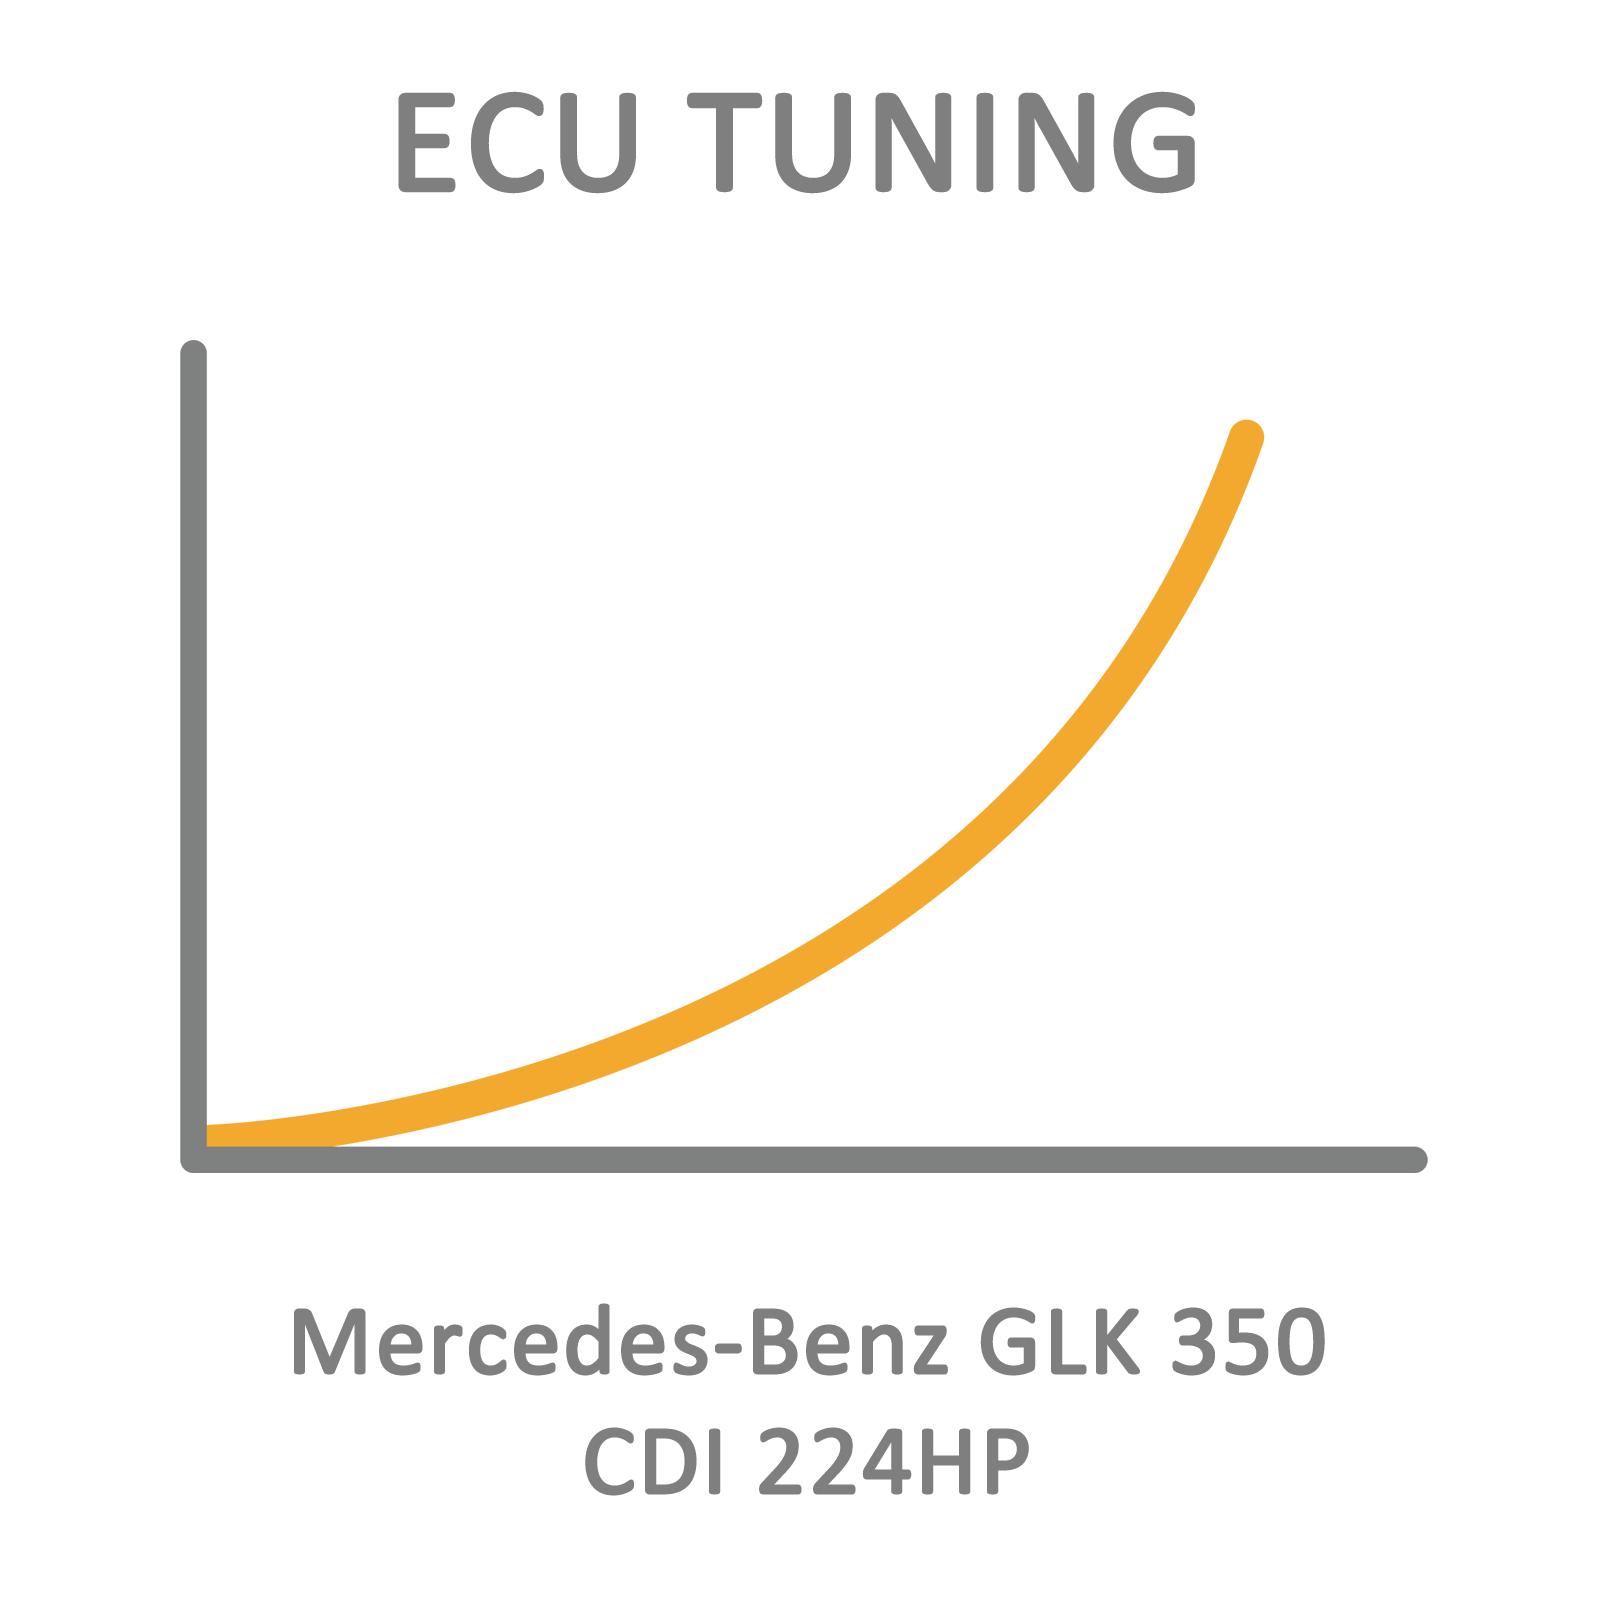 Mercedes-Benz GLK 350 CDI 224HP ECU Tuning Remapping